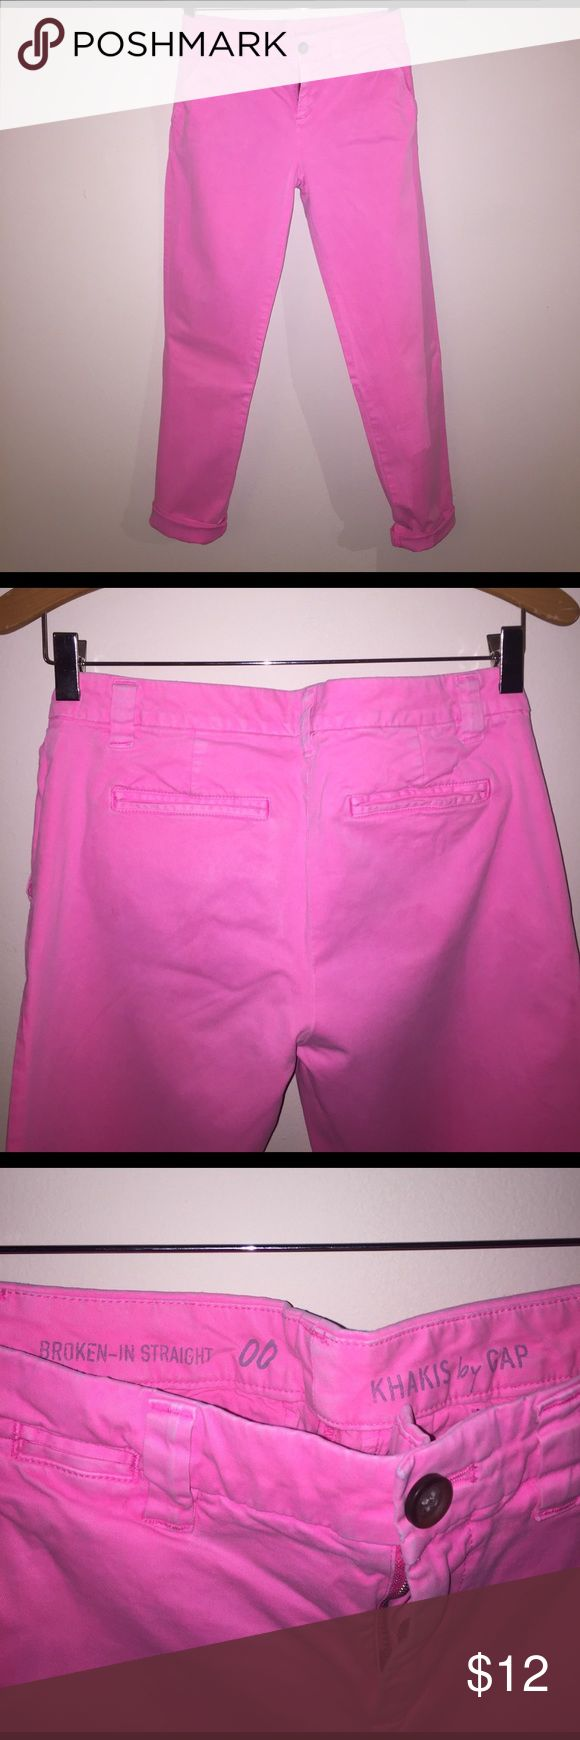 Gap Broken-In Girlfriend khaki pants. Neon pink. Gap Broken-In Girlfriend khaki pants. Neon pink. GAP Pants